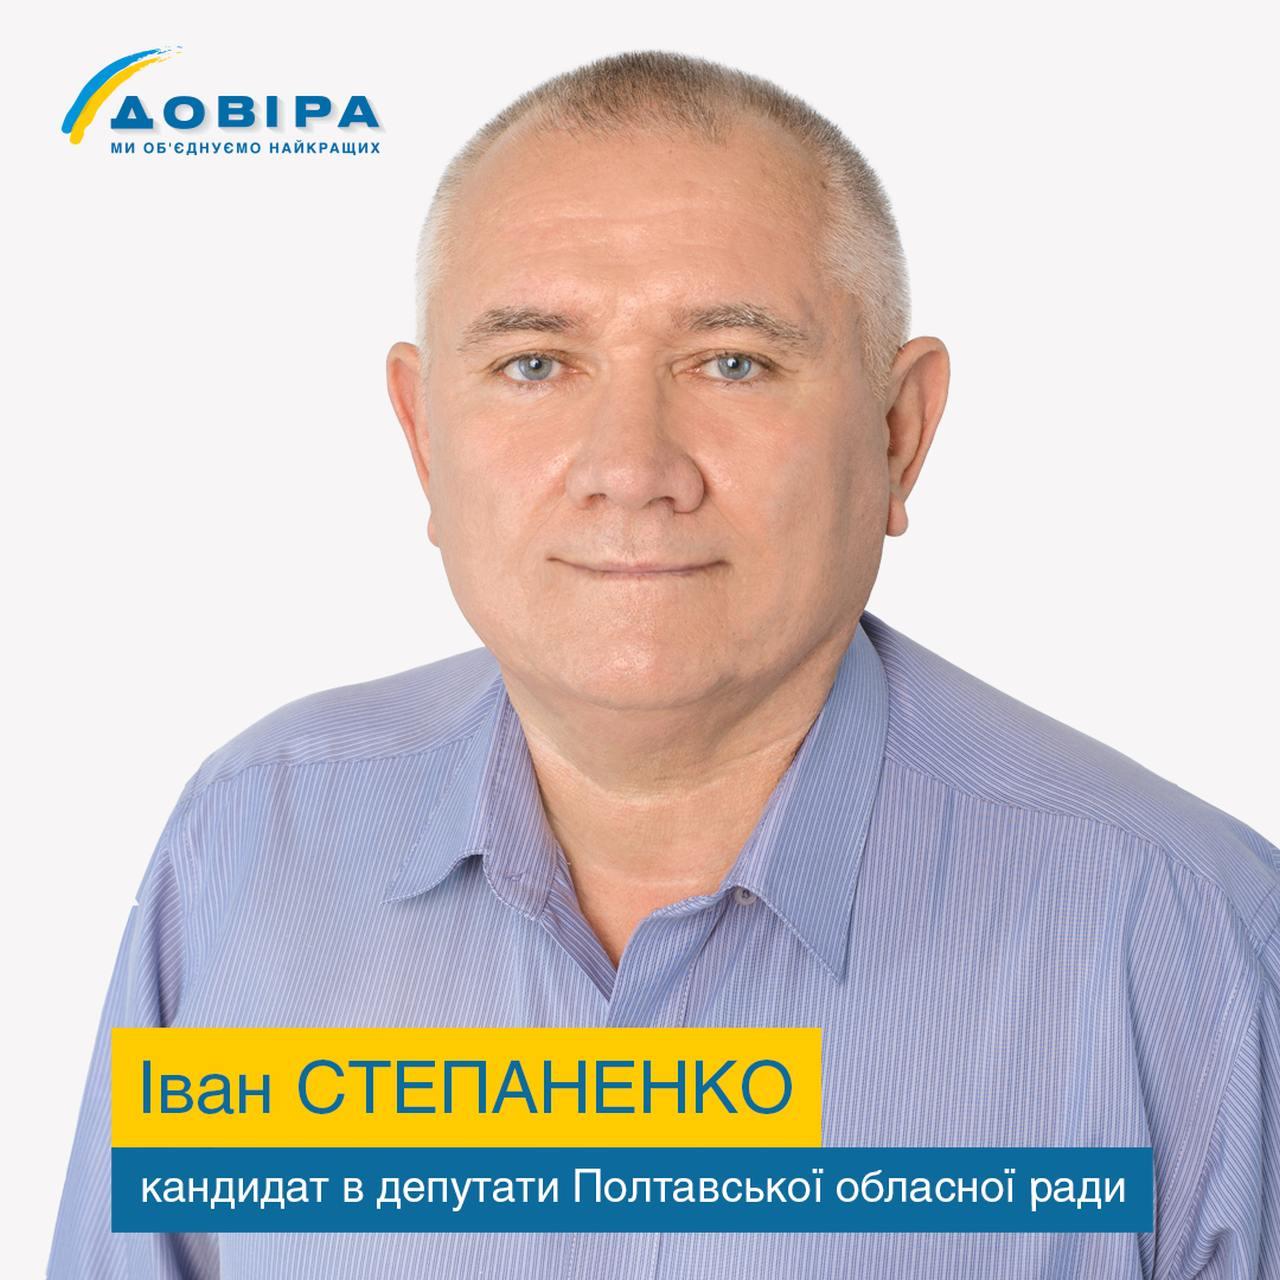 Іван Степаненко